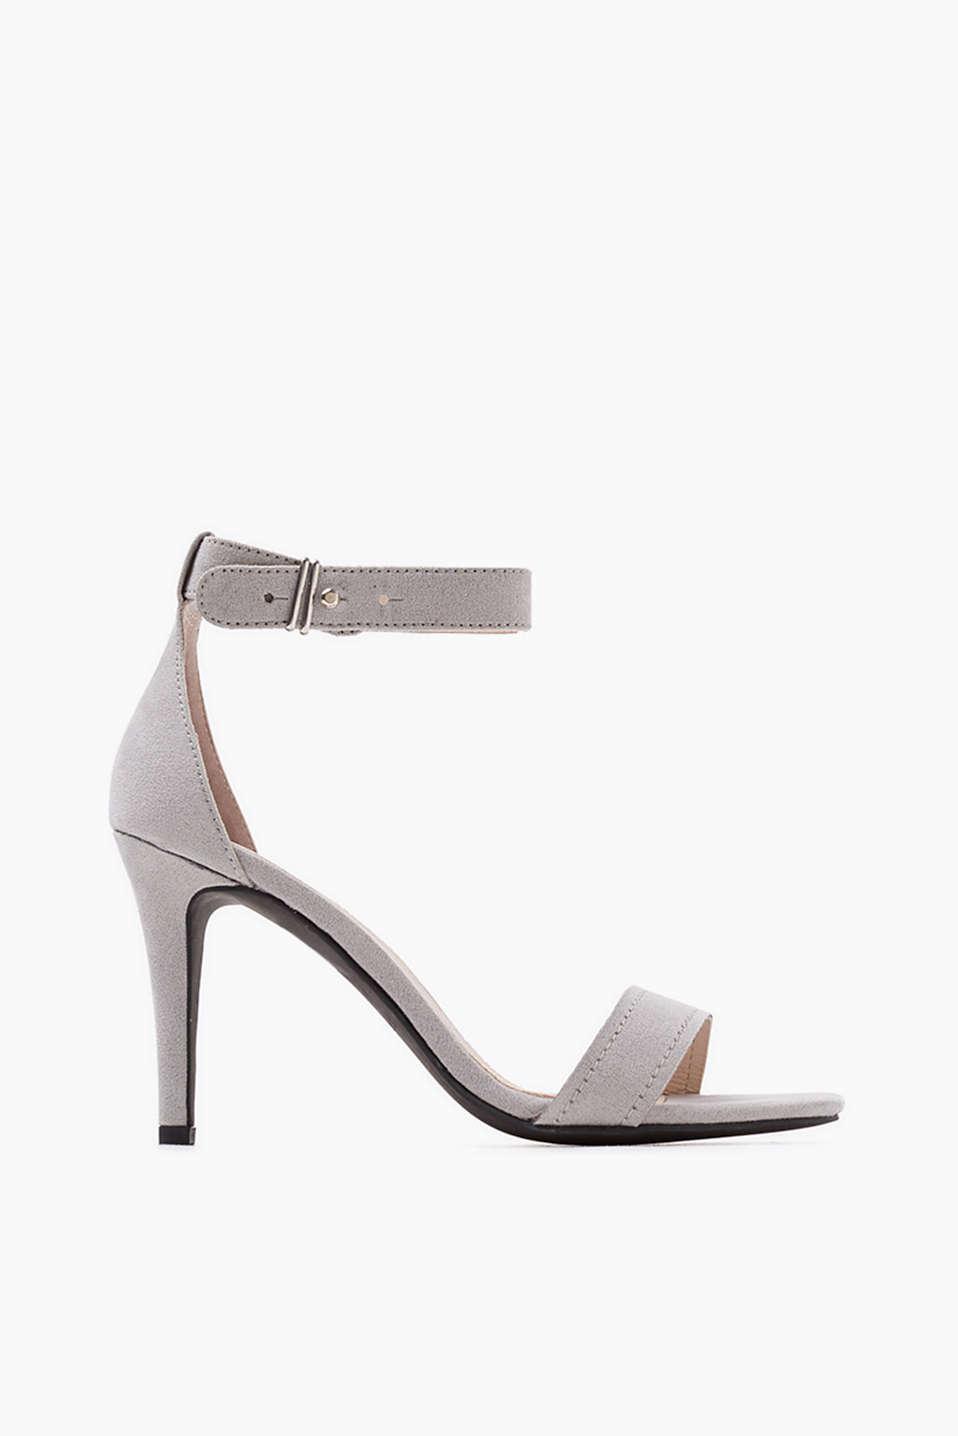 Black esprit sandals - Slim Sandals With A Stiletto Heel In Faux Suede